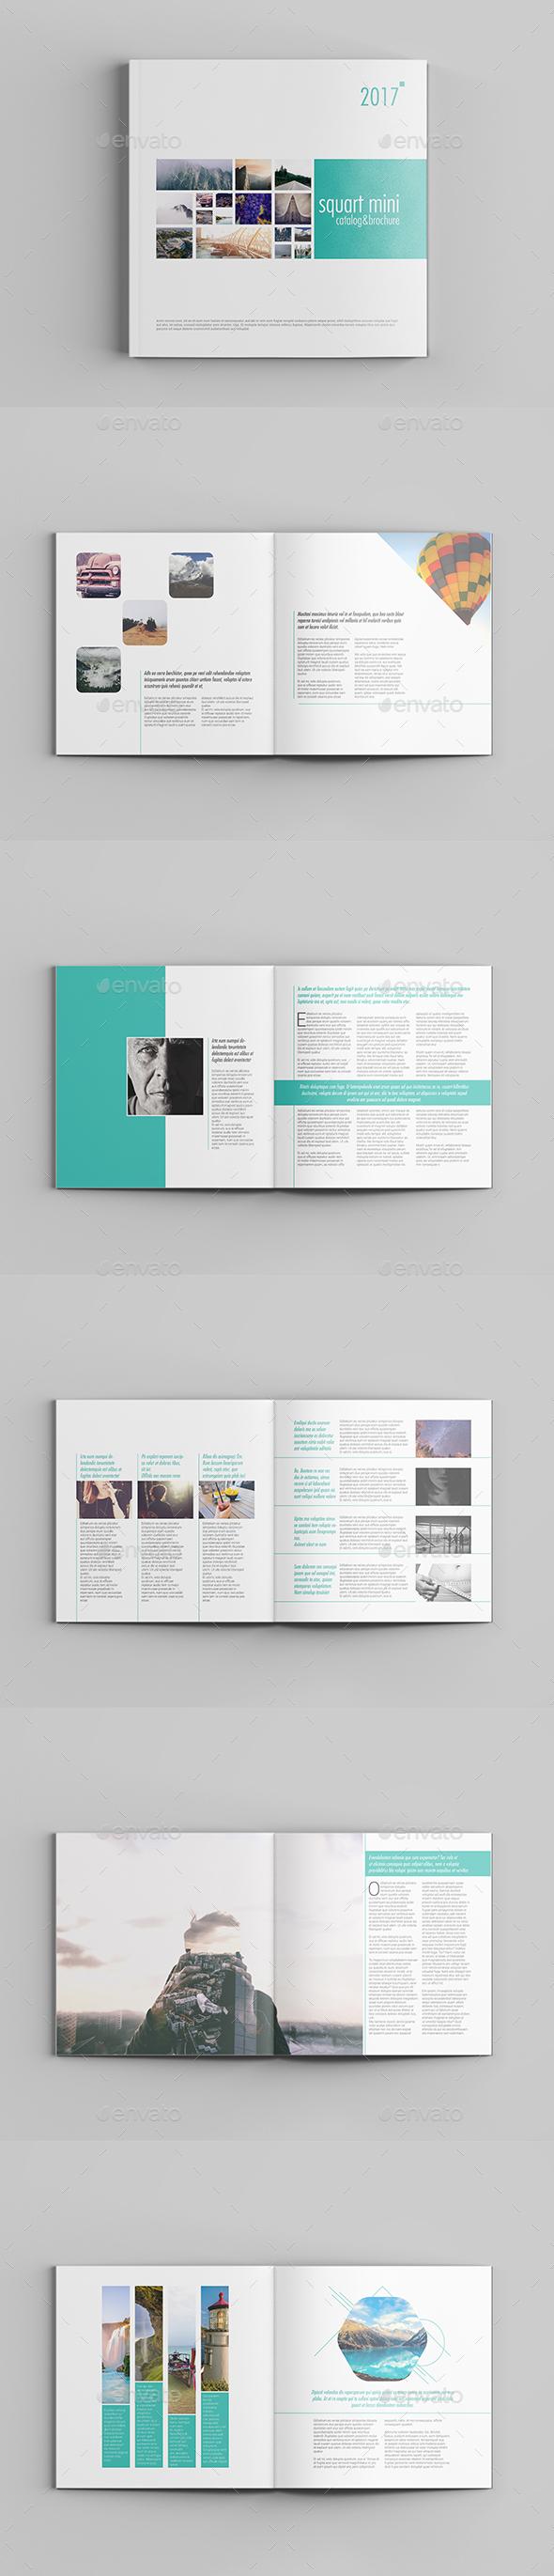 Squart Mini Catalog 12 Pages - Brochures Print Templates